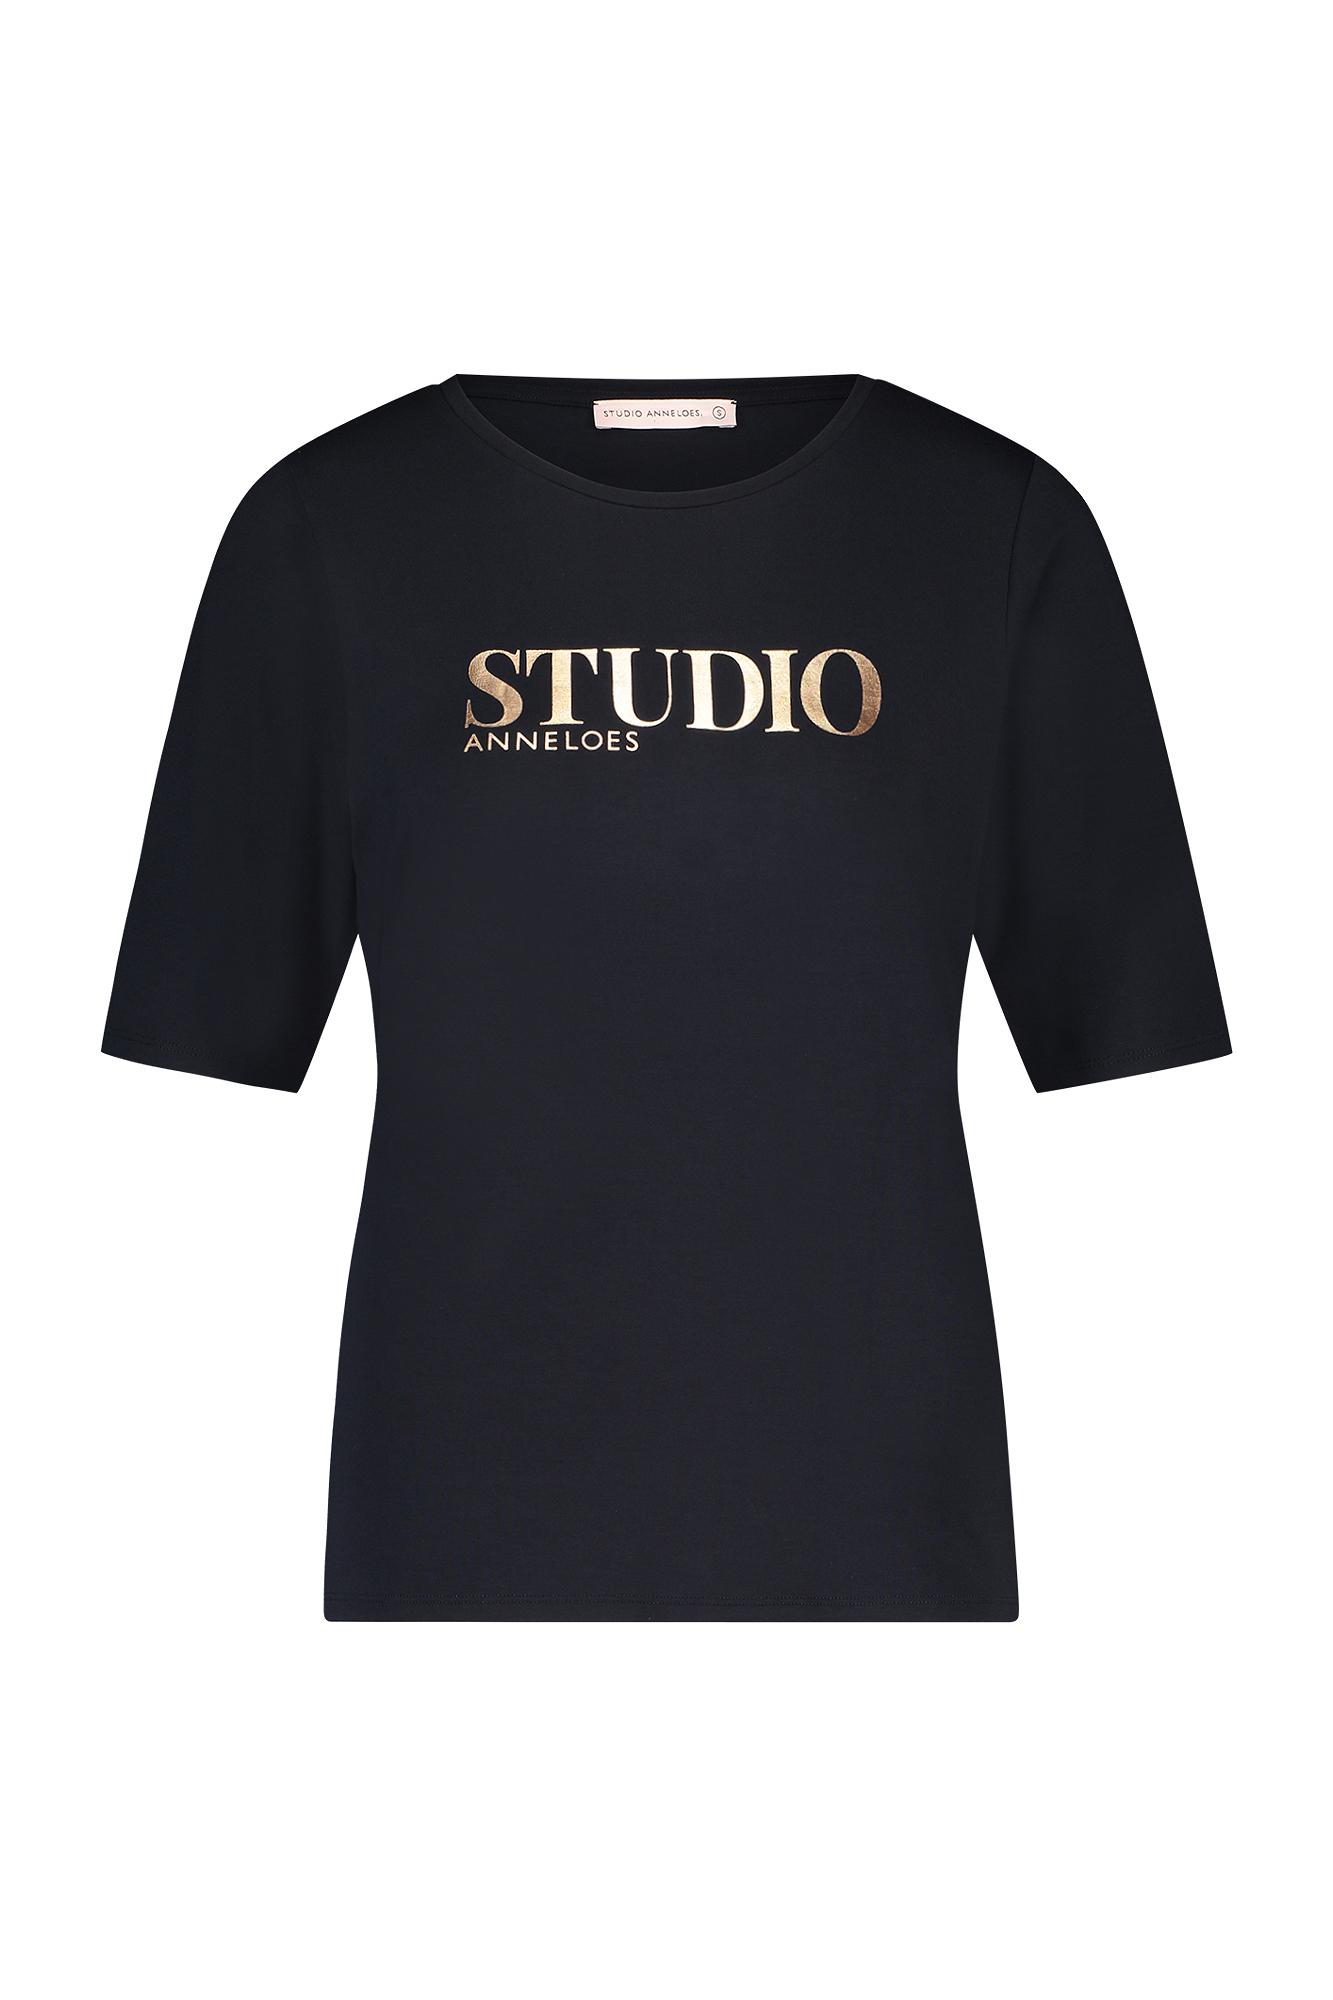 Studio logo shirt